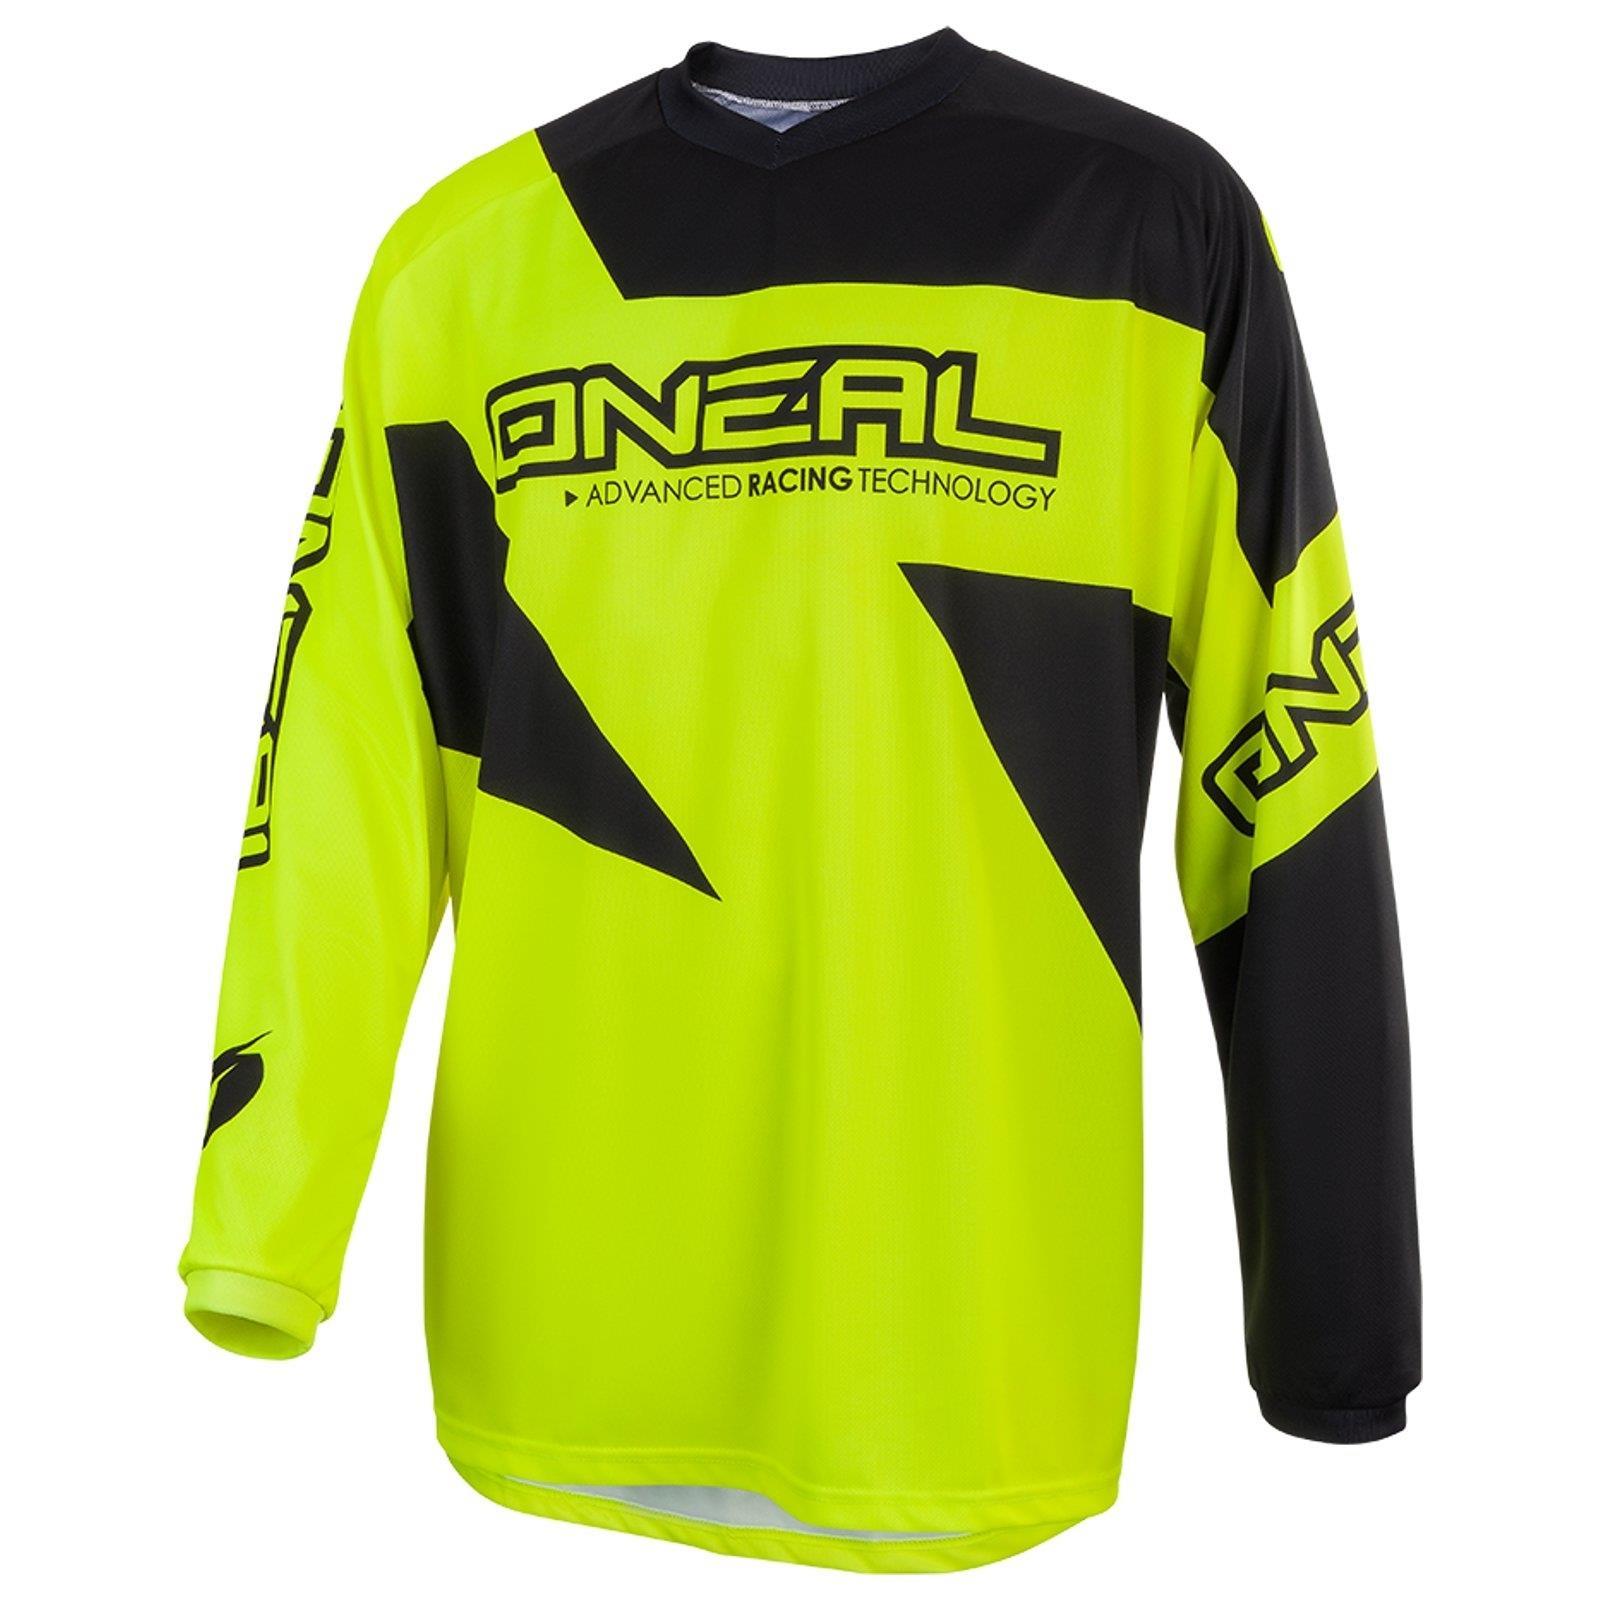 O'Neal Element Mayhem Jersey Racewear Motocross Trikot MX DH FR FR DH MTB Mountainbike de428a